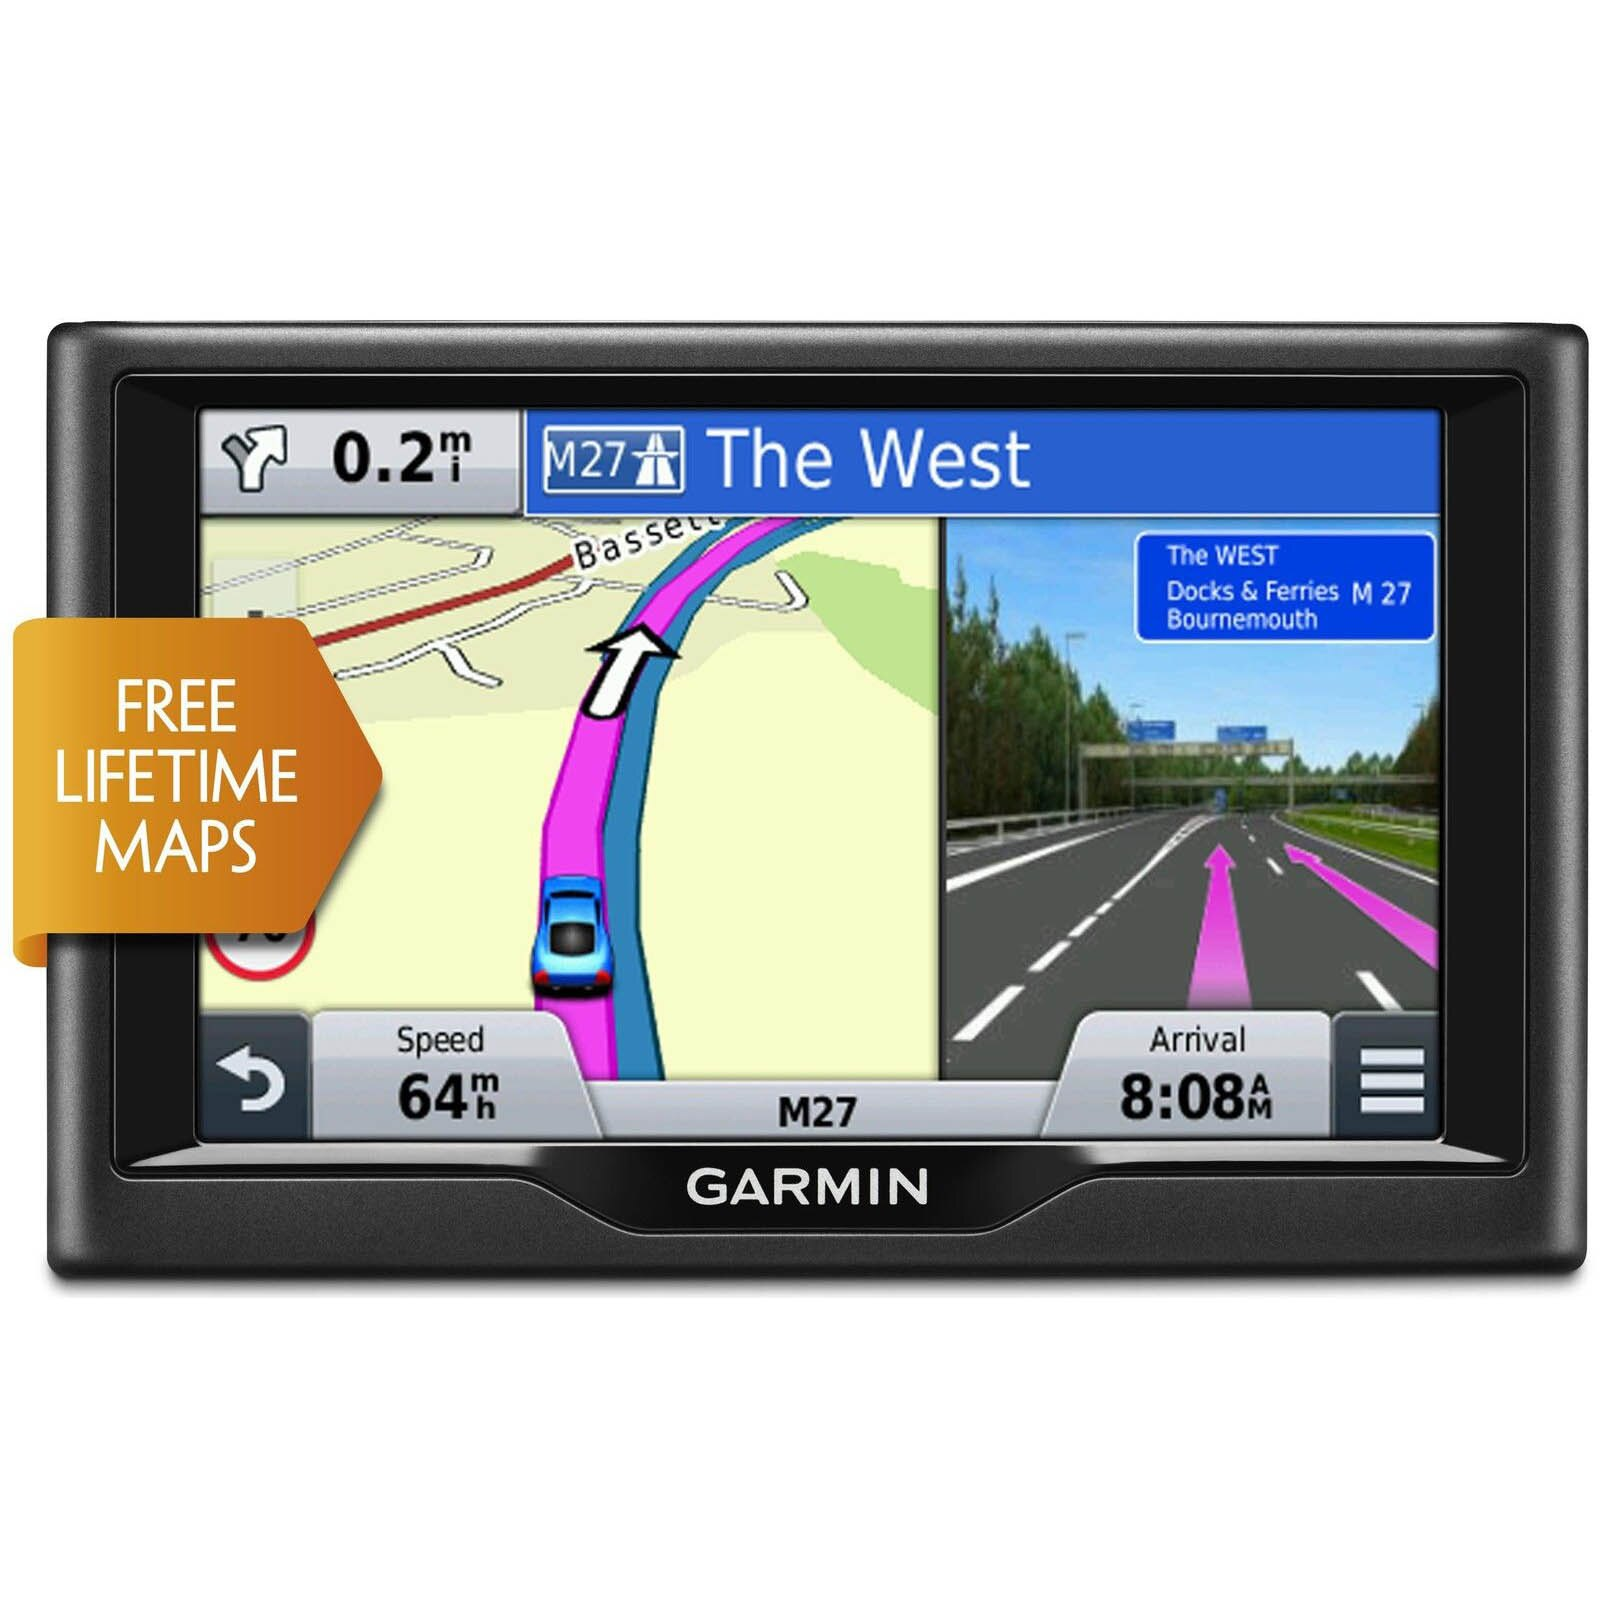 ProElectronics Distributing Inc Rakuten Garmin Nuvi 58LM 5 GPS